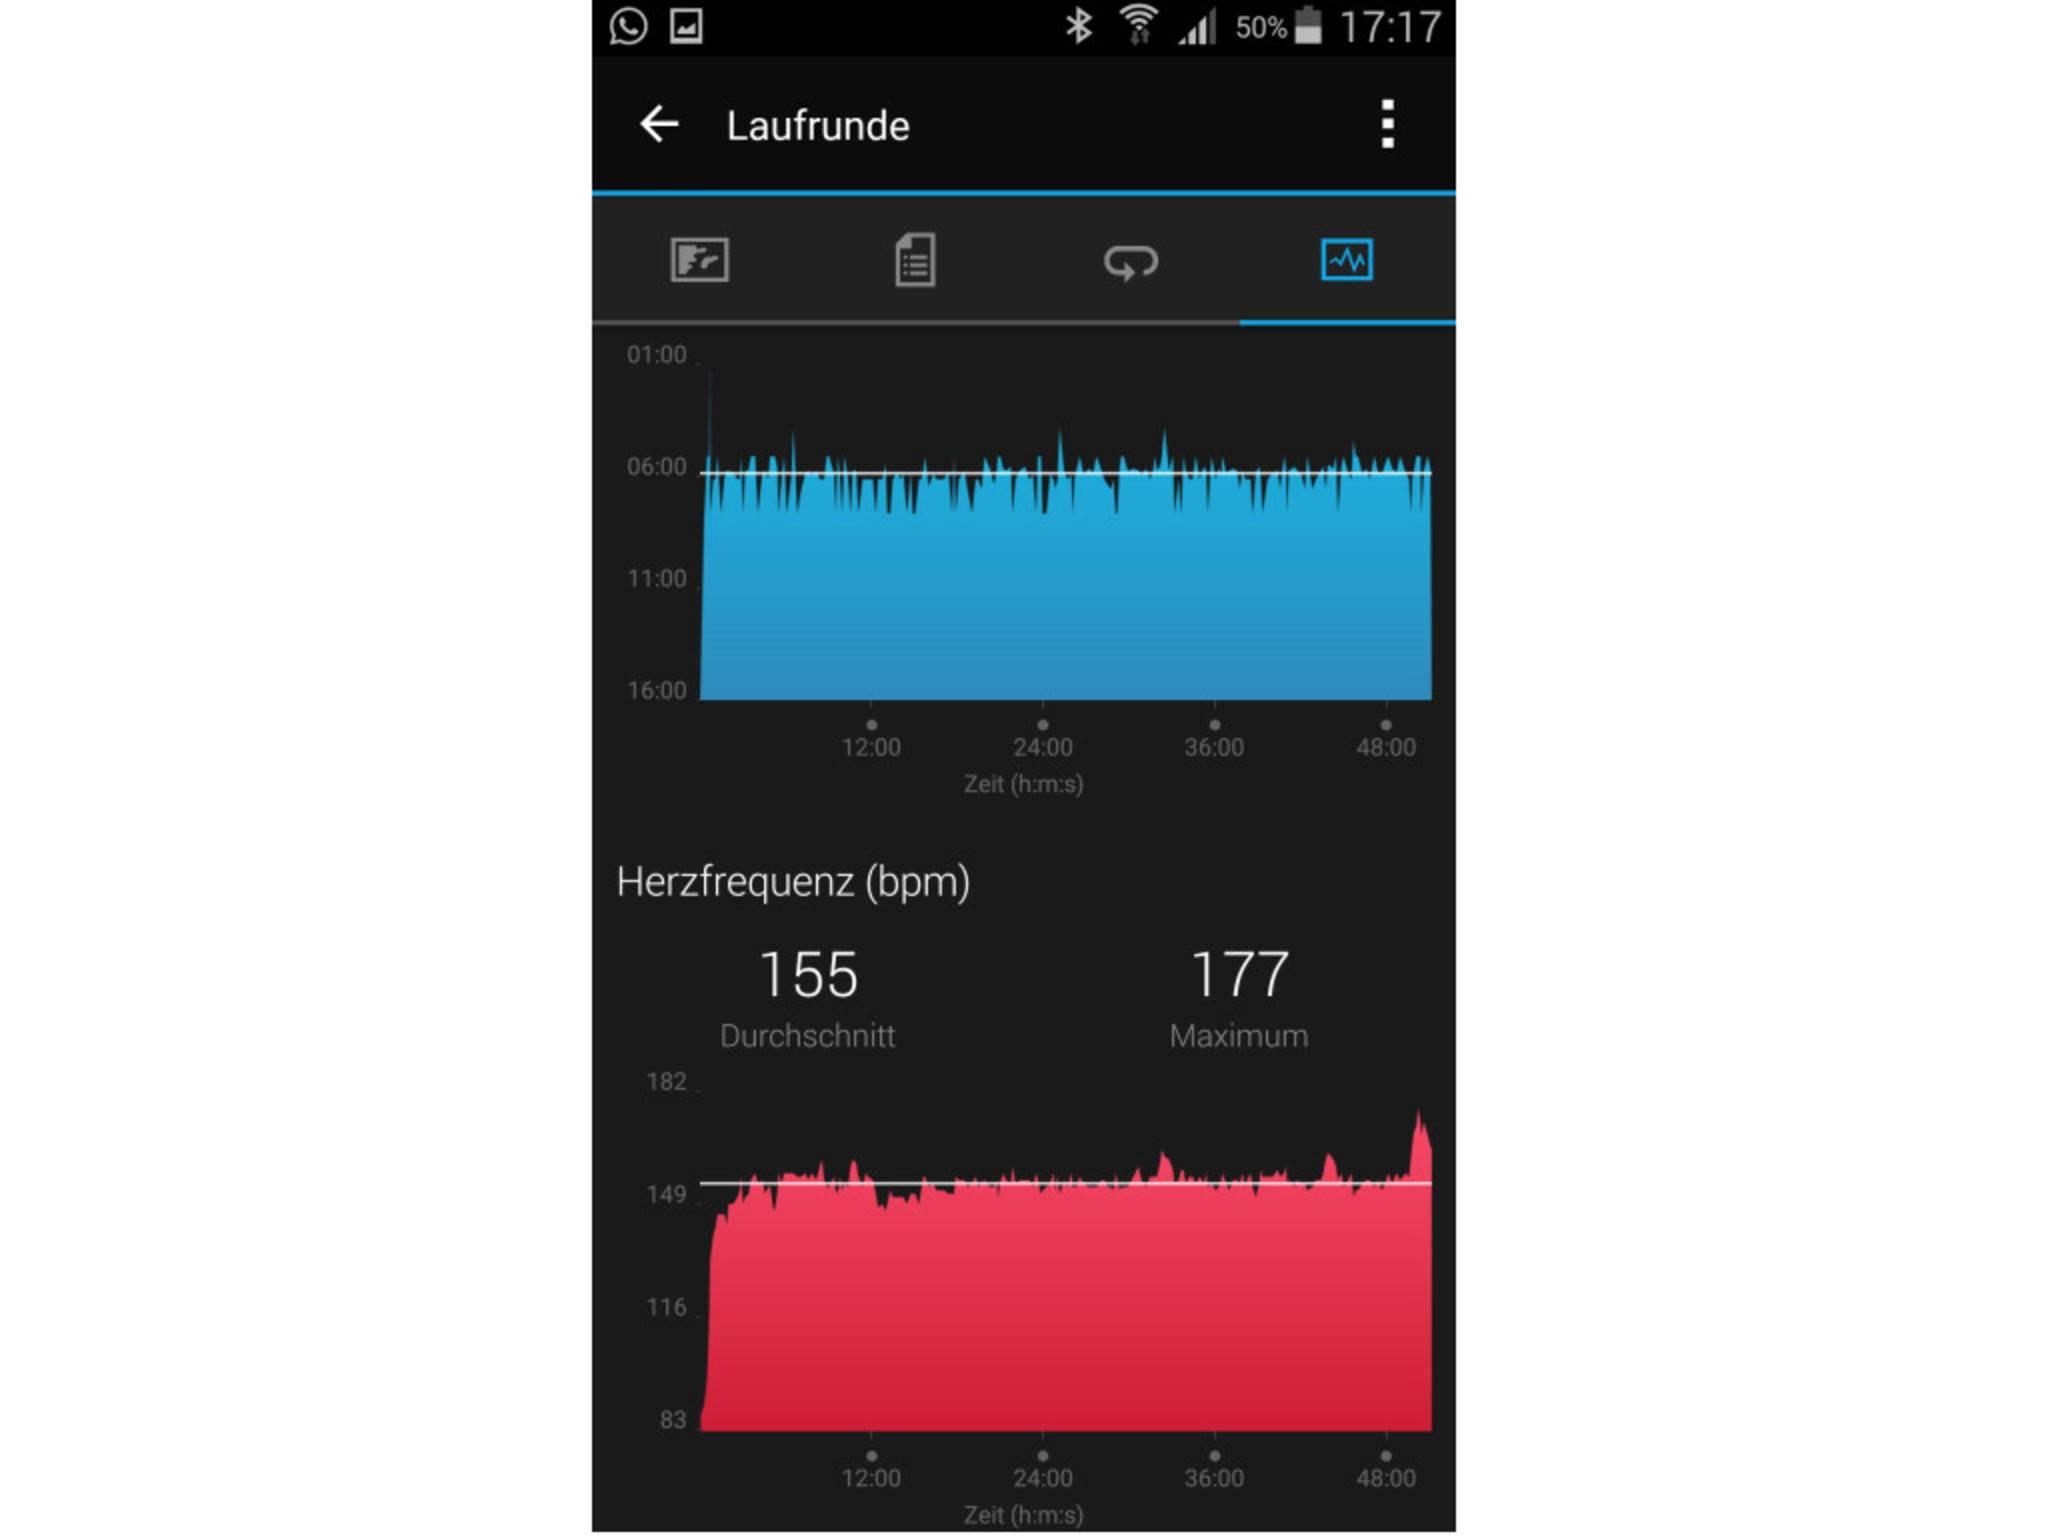 Garmin Vivosmart HR App 6